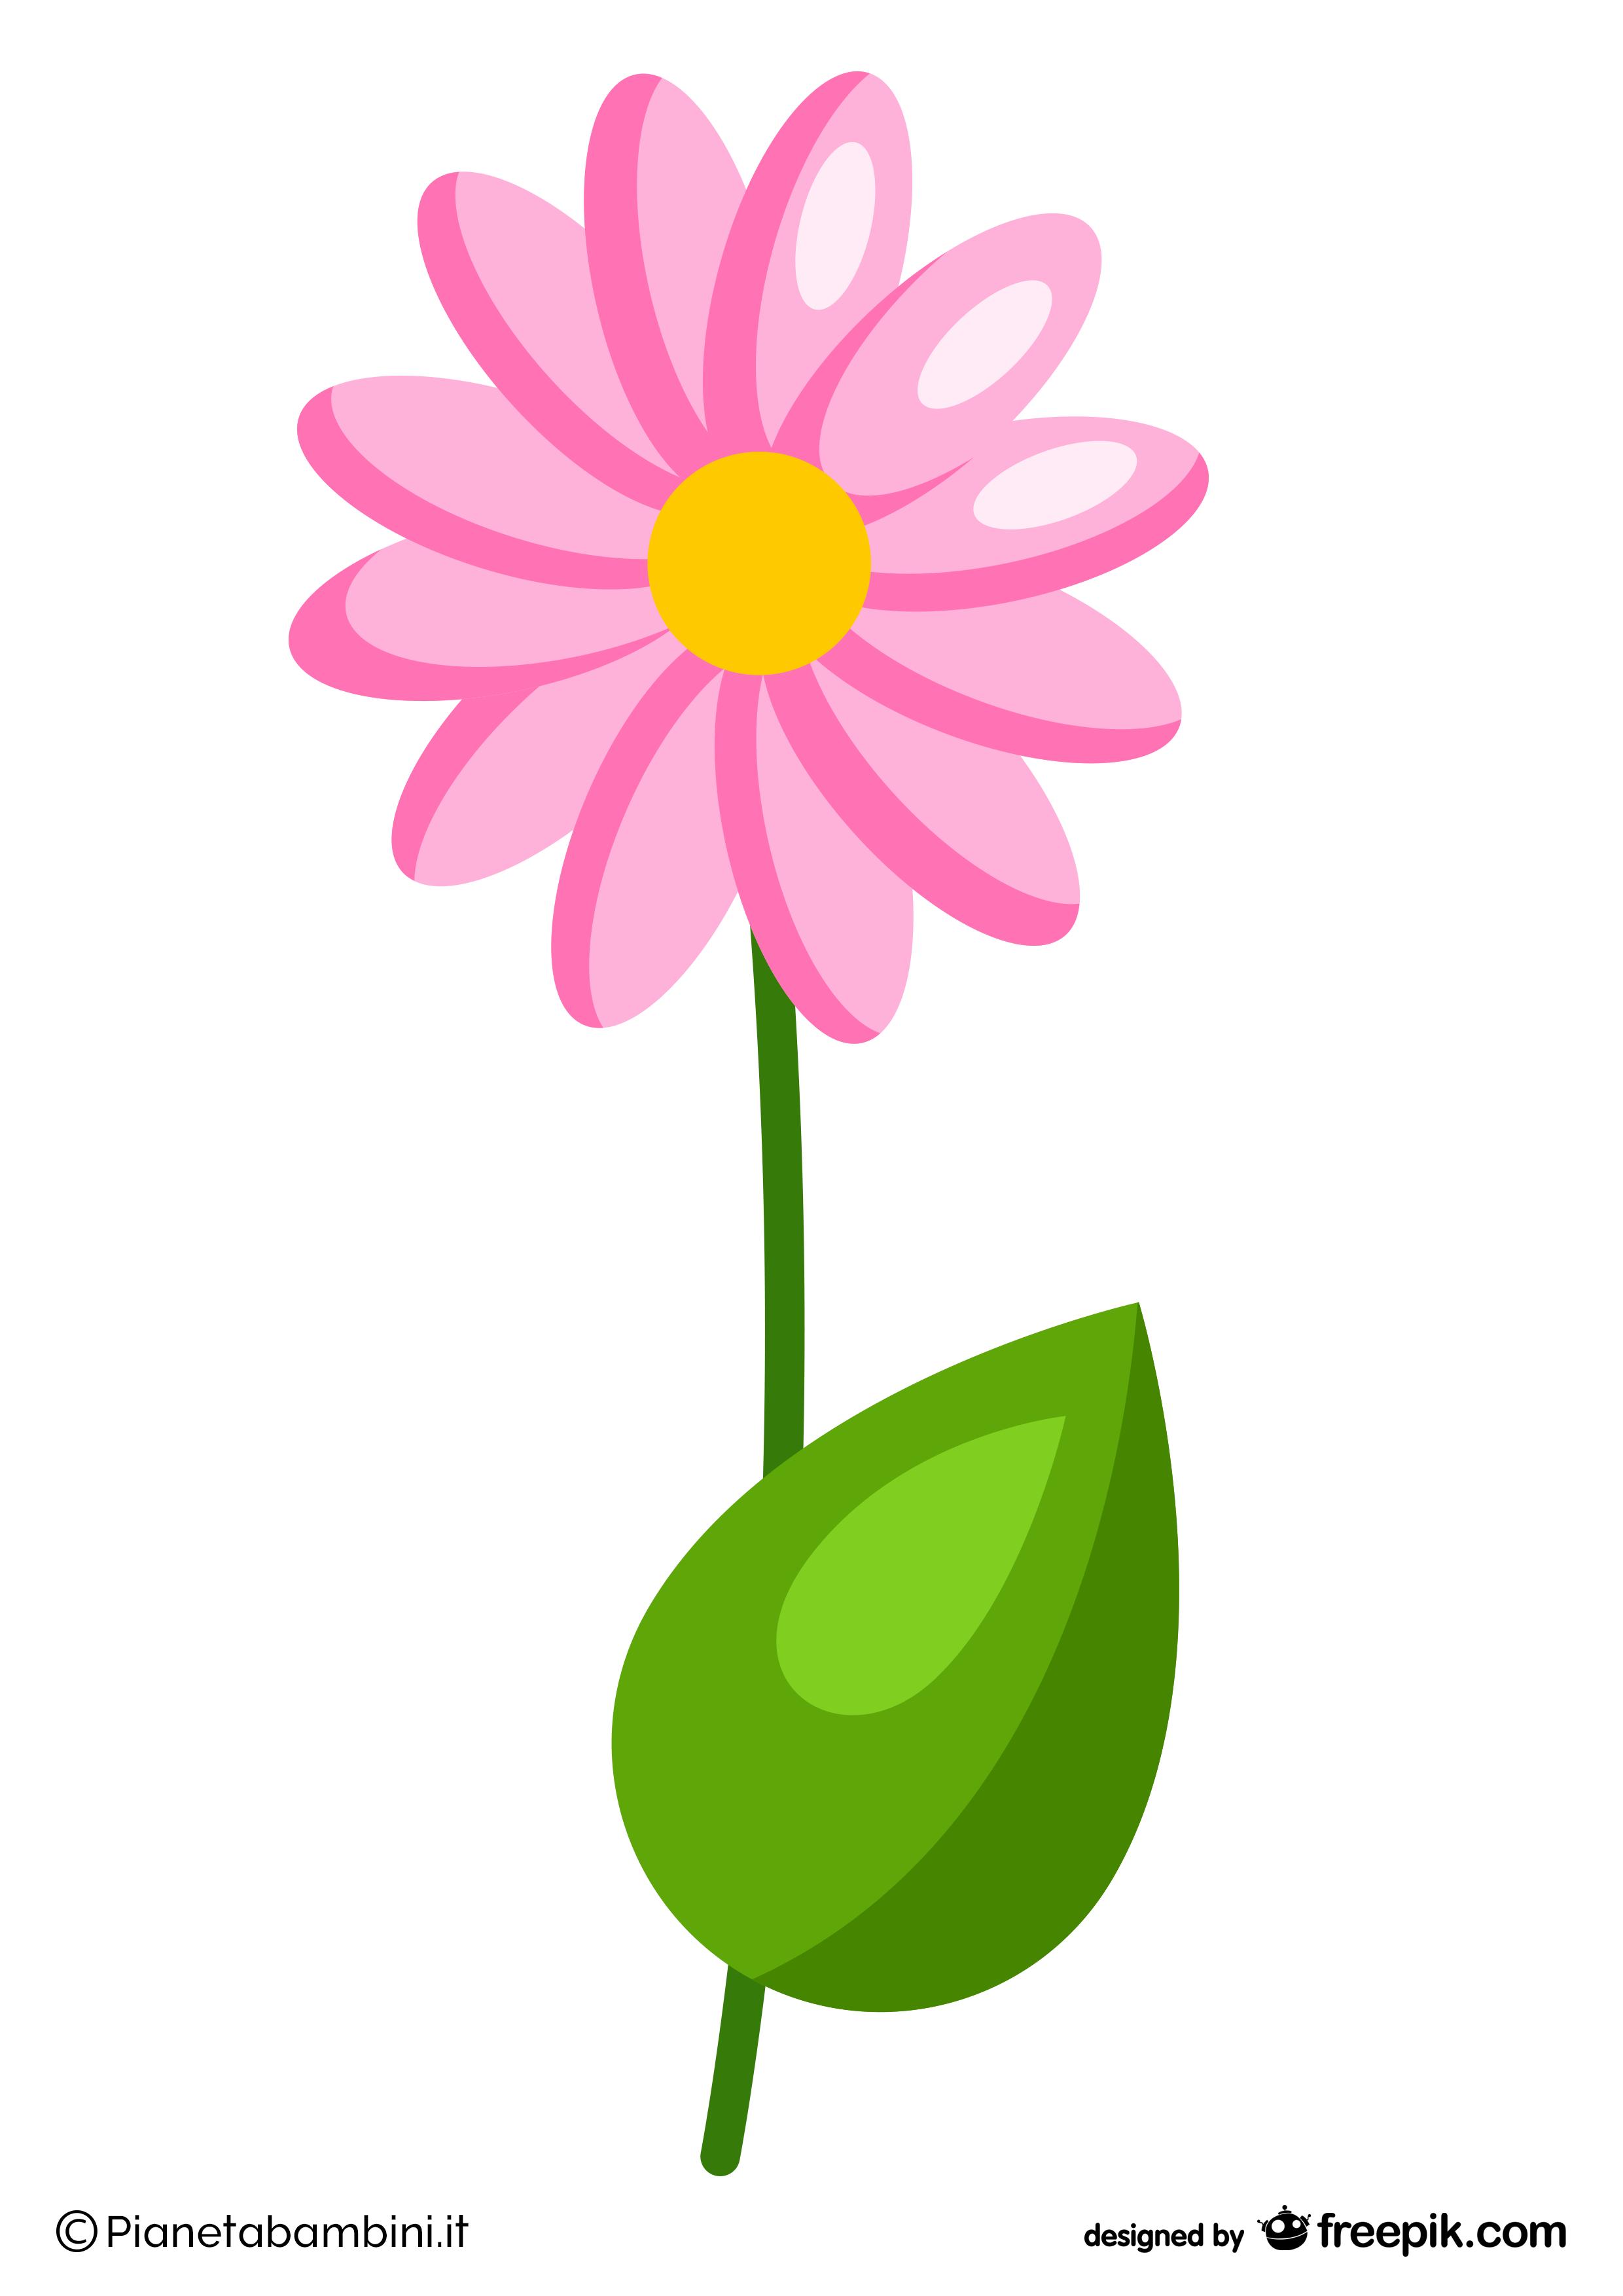 Addobbi Di Primavera Per Finestre Aule E Camerette Da Stampare